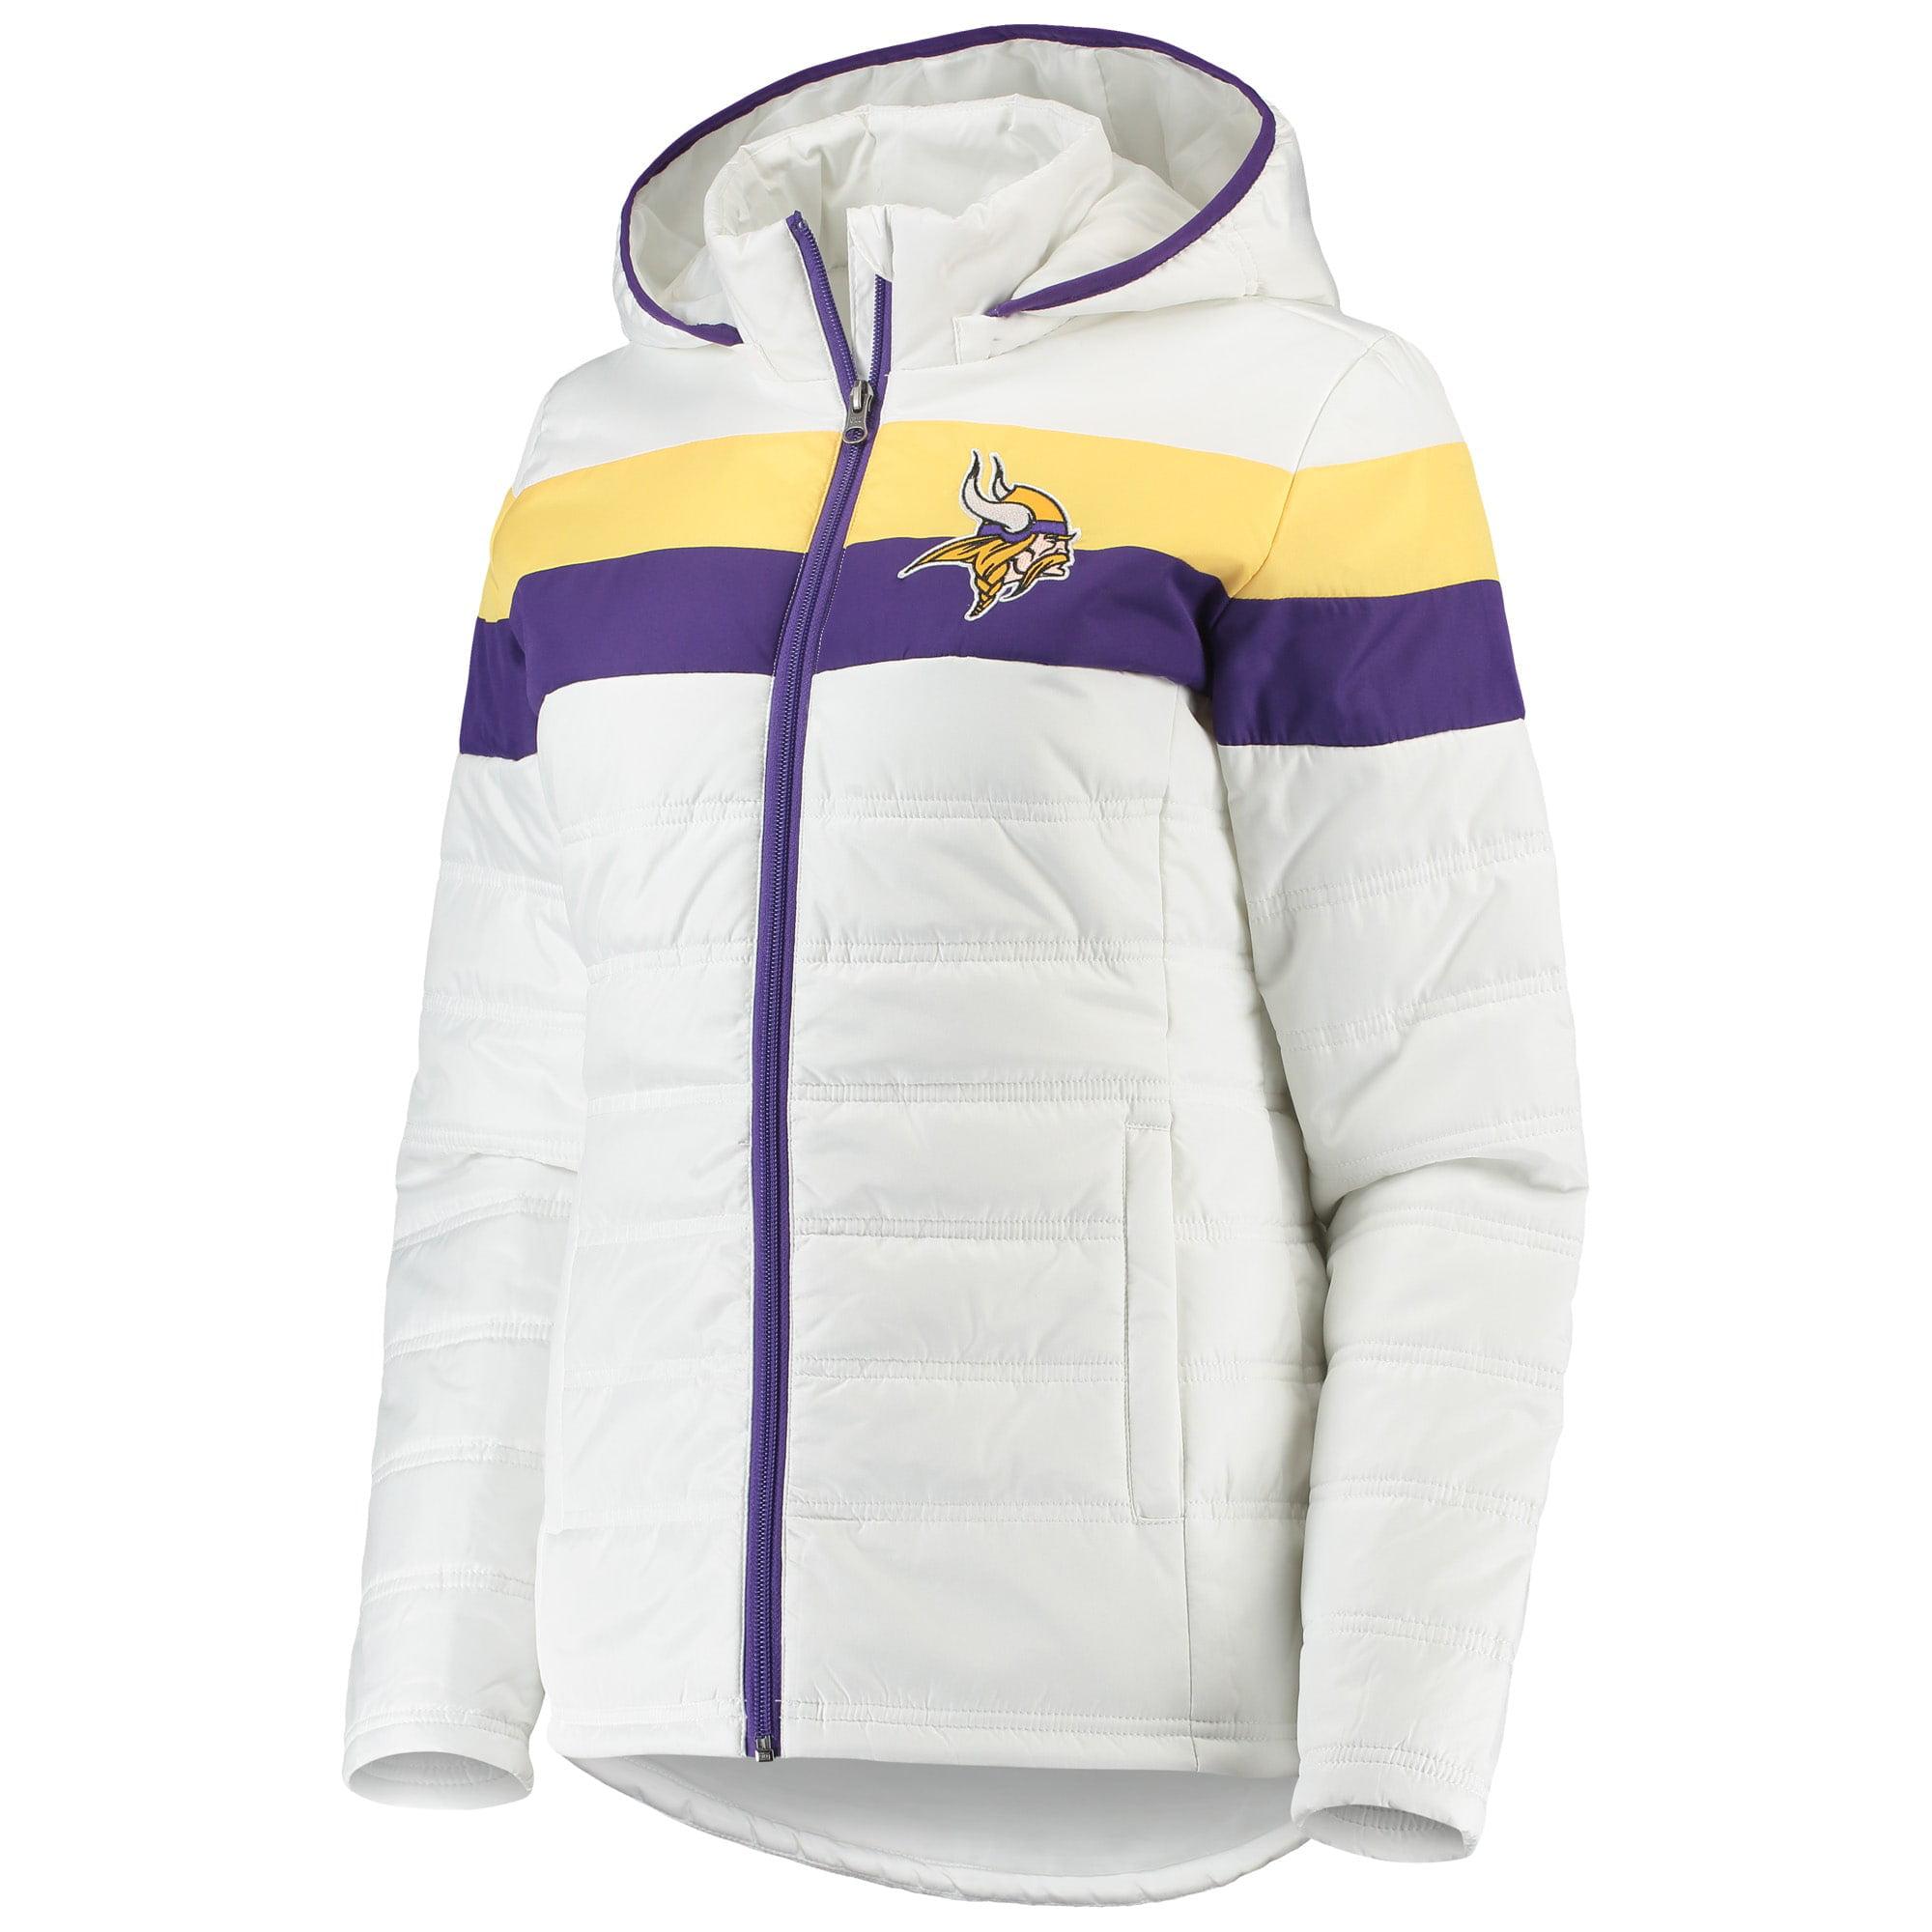 New Auburn Tigers Womens Size S-M-L Long Body Full Zip Hoodie Jacket $72